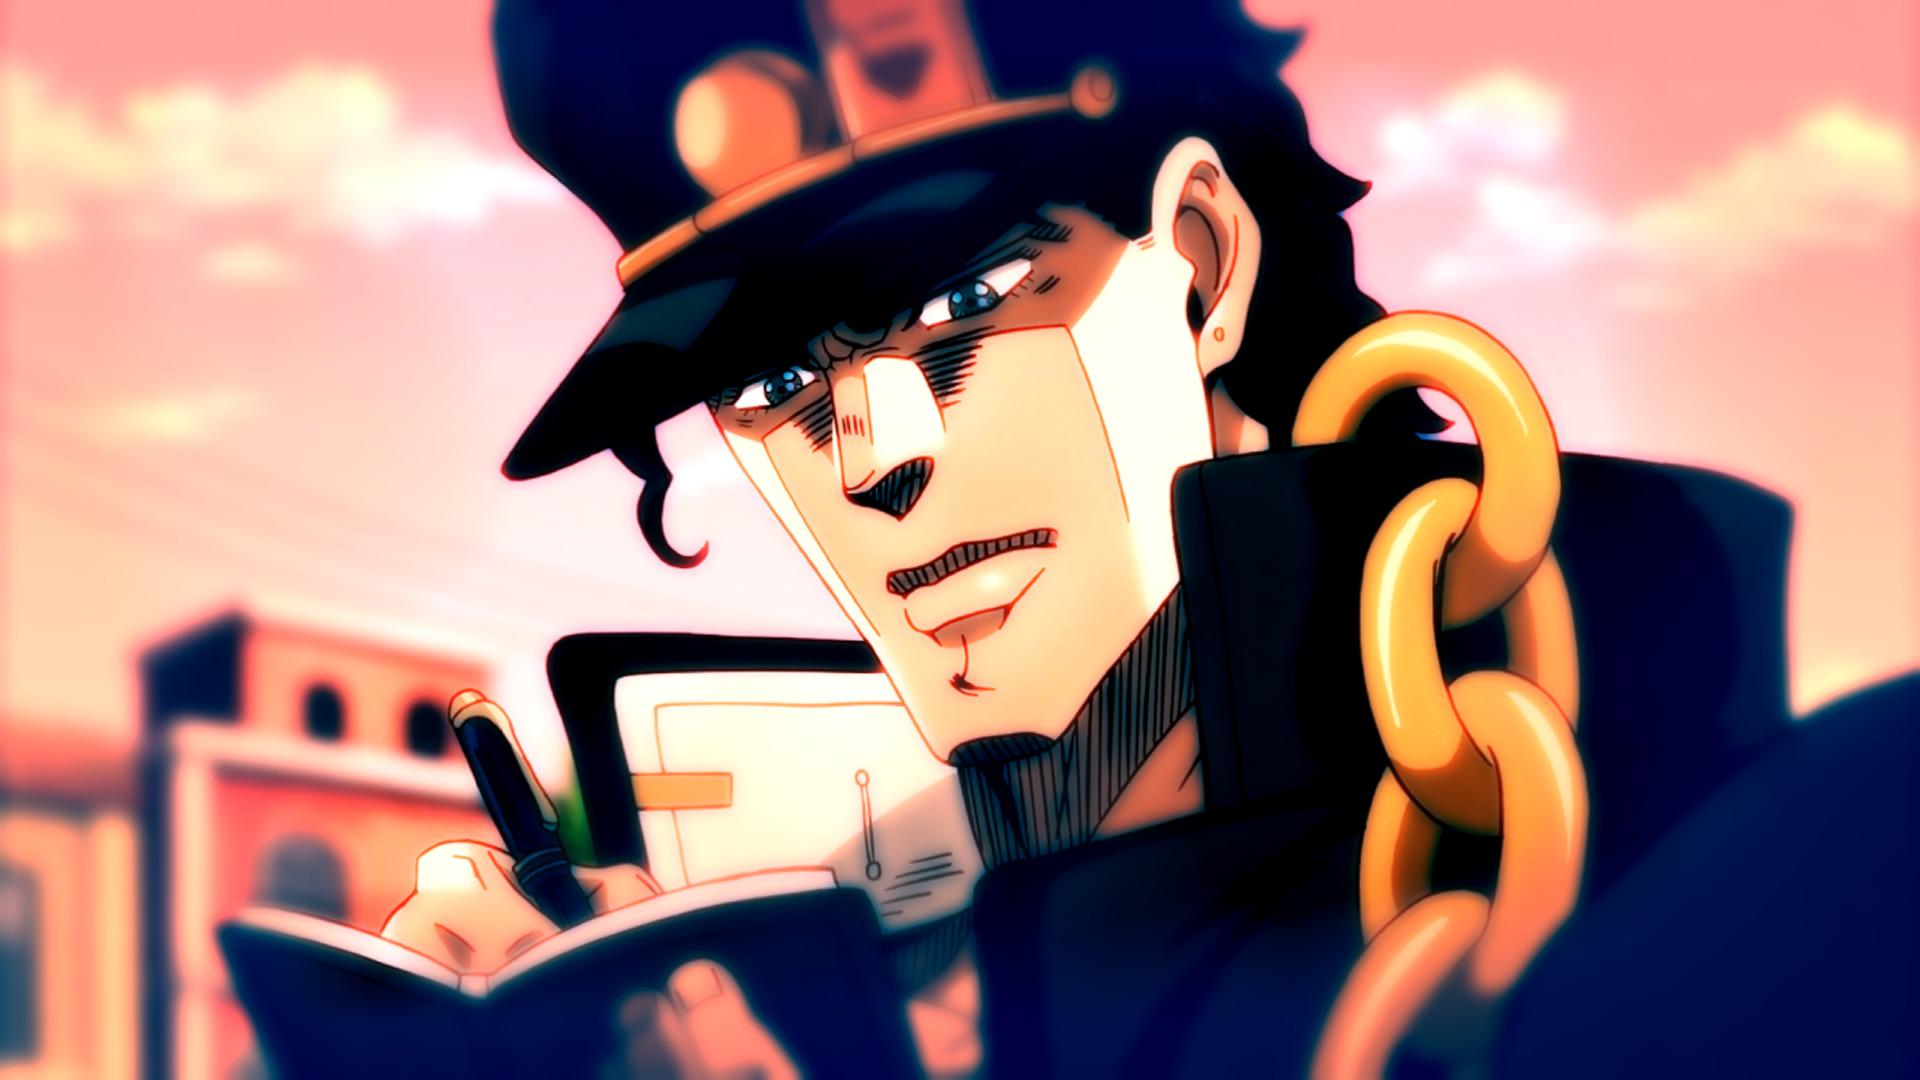 Anime – Jojo's Bizarre Adventure Jotaro Kujo Bakgrund